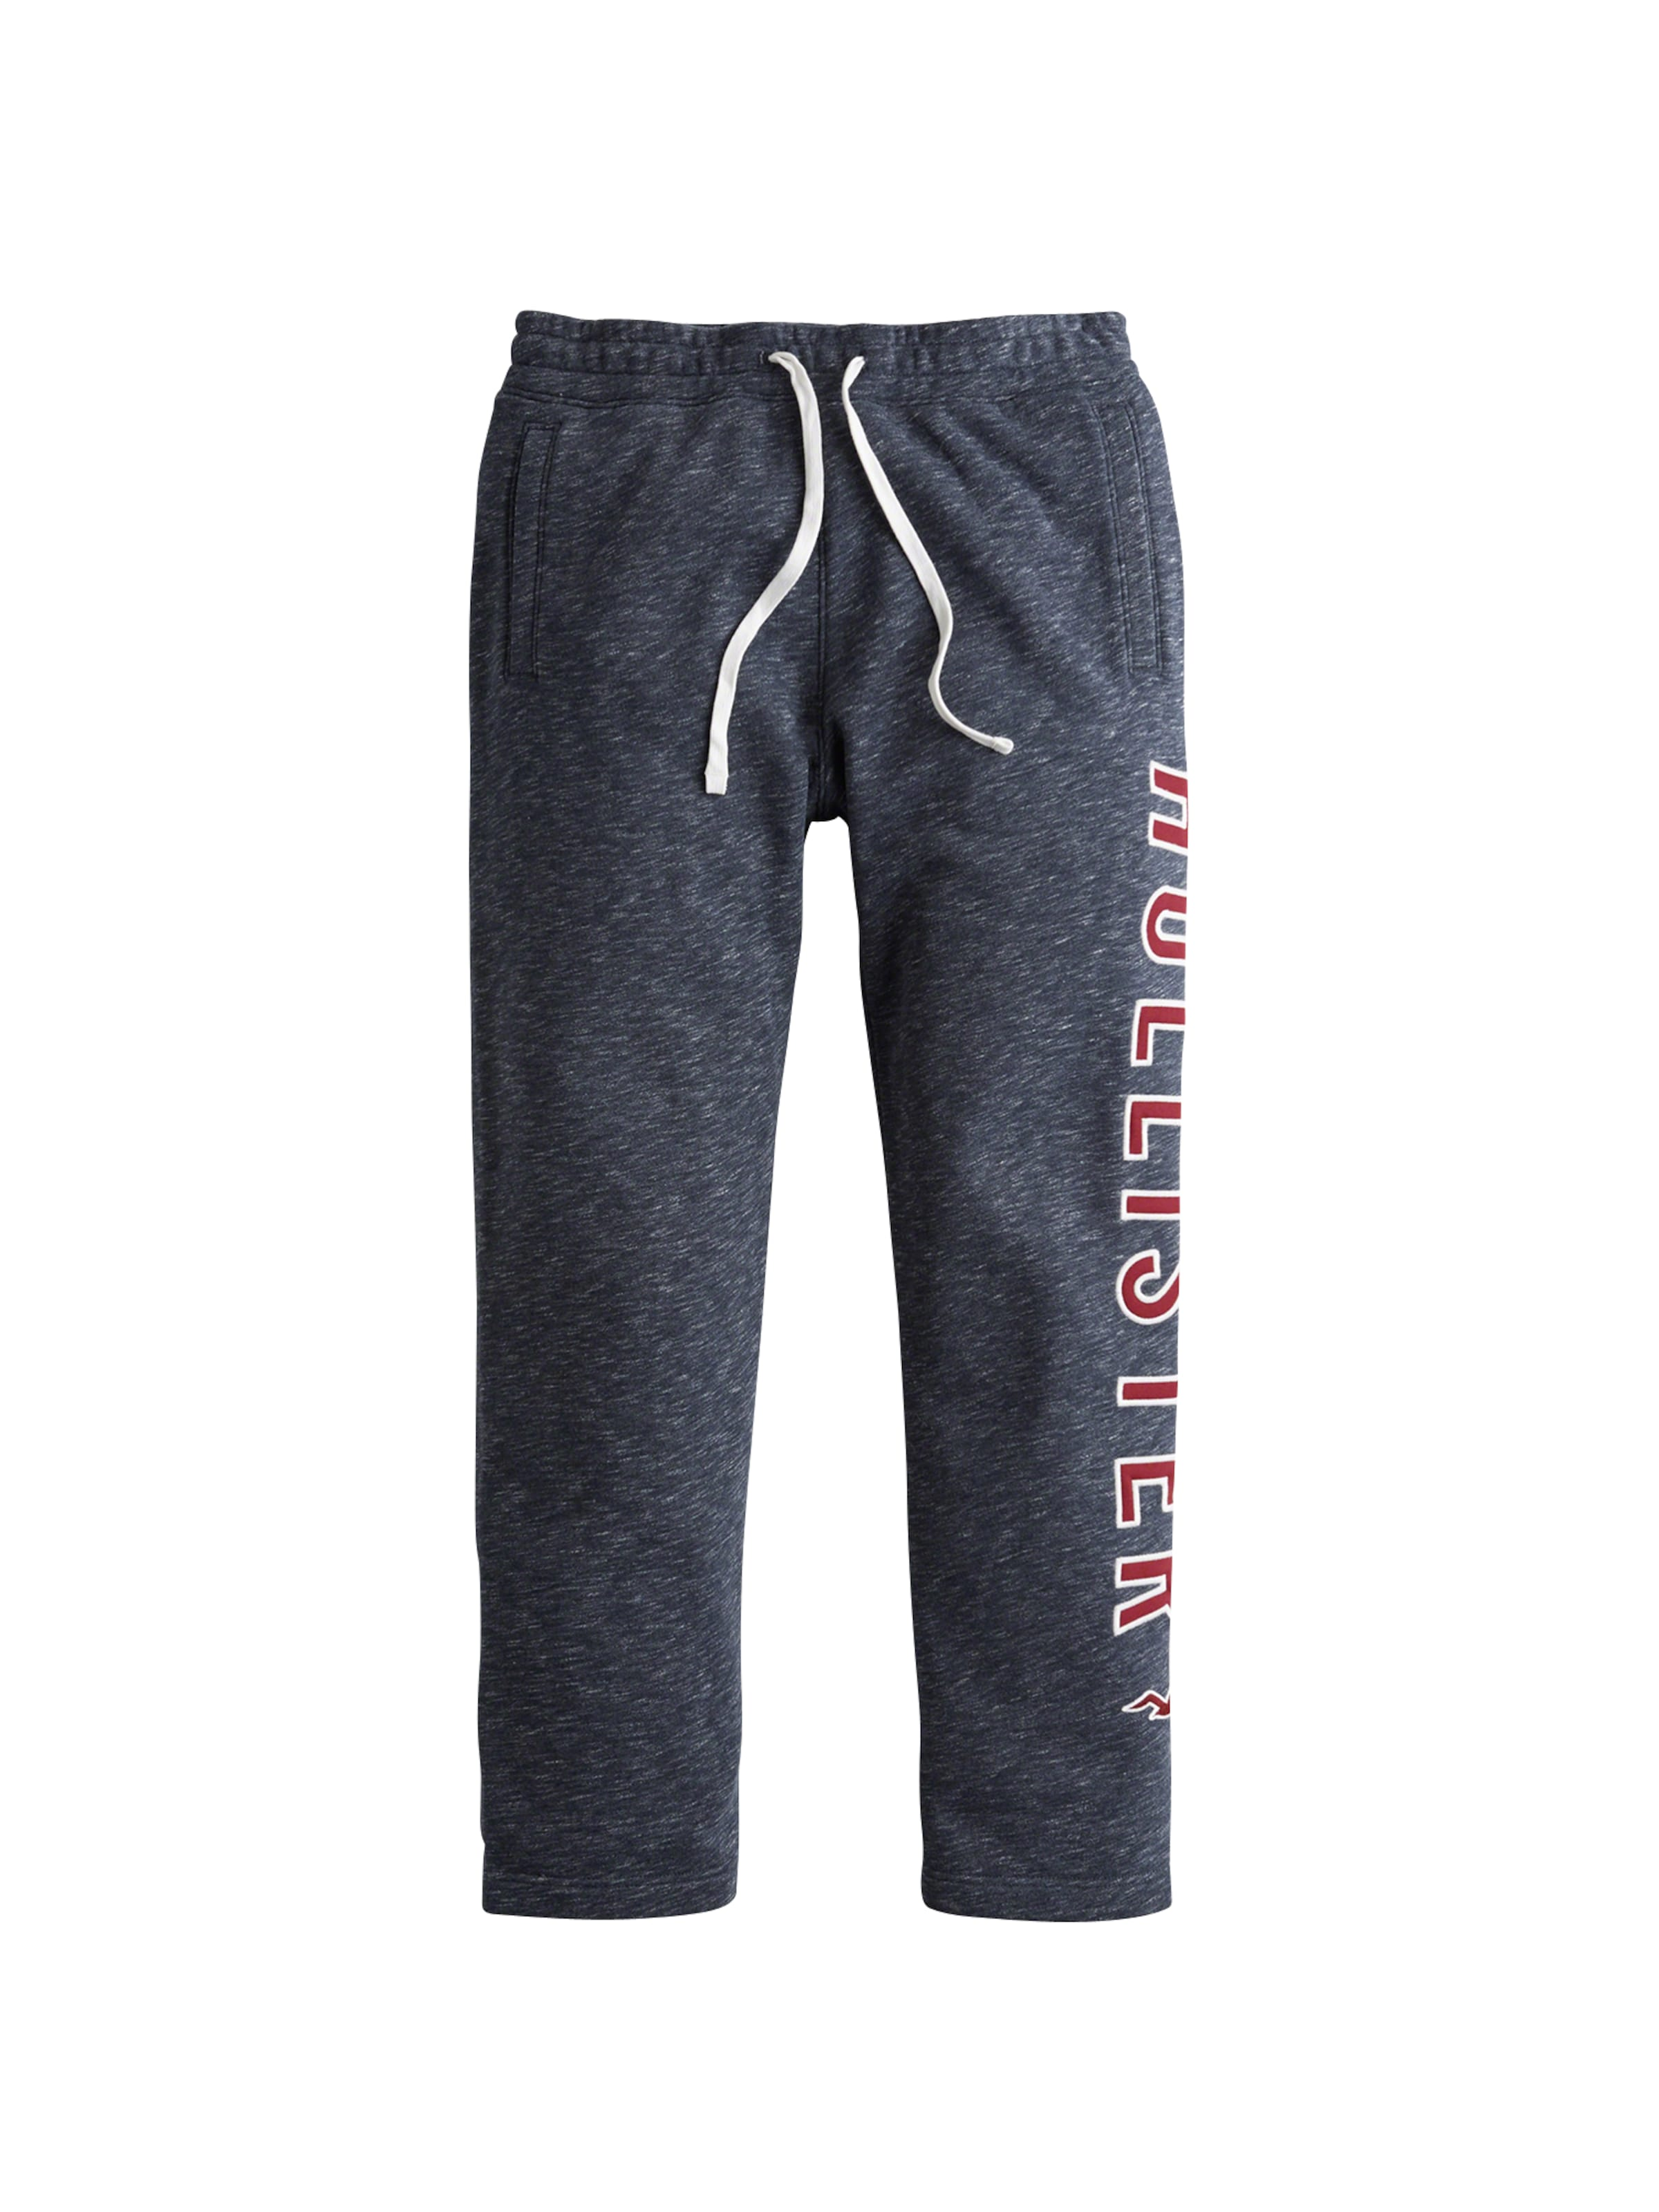 NavyKirschrot Straight Leg' Weiß Logo Hollister 'iconic Hose In gyf76Yb